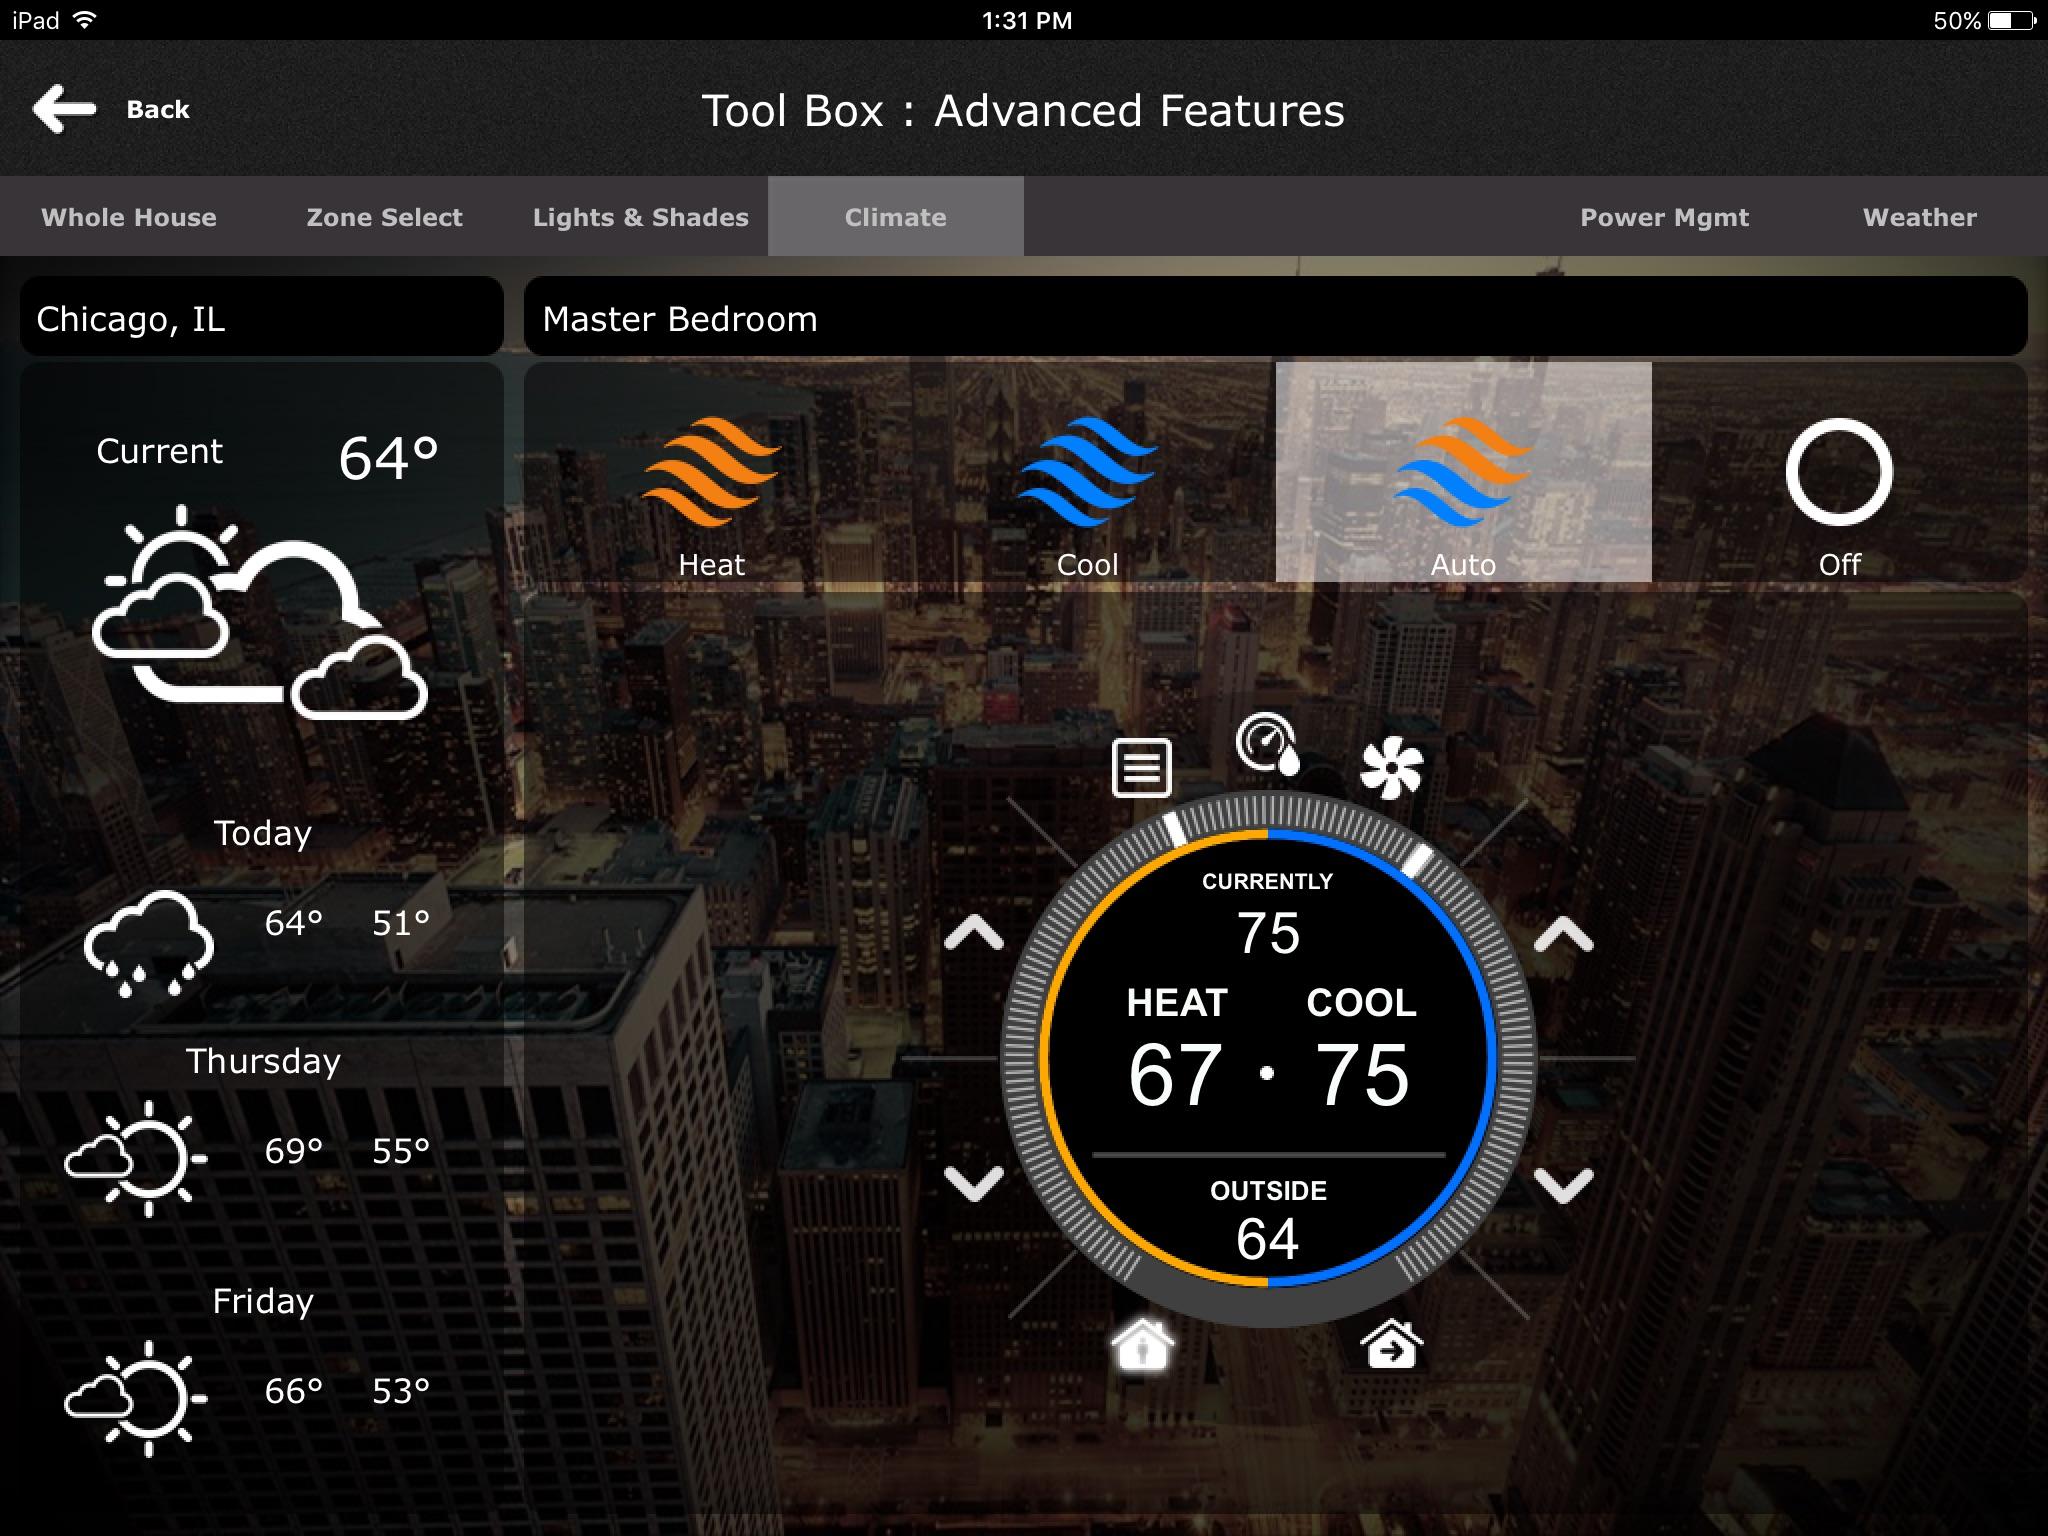 iPad Thermostat Control